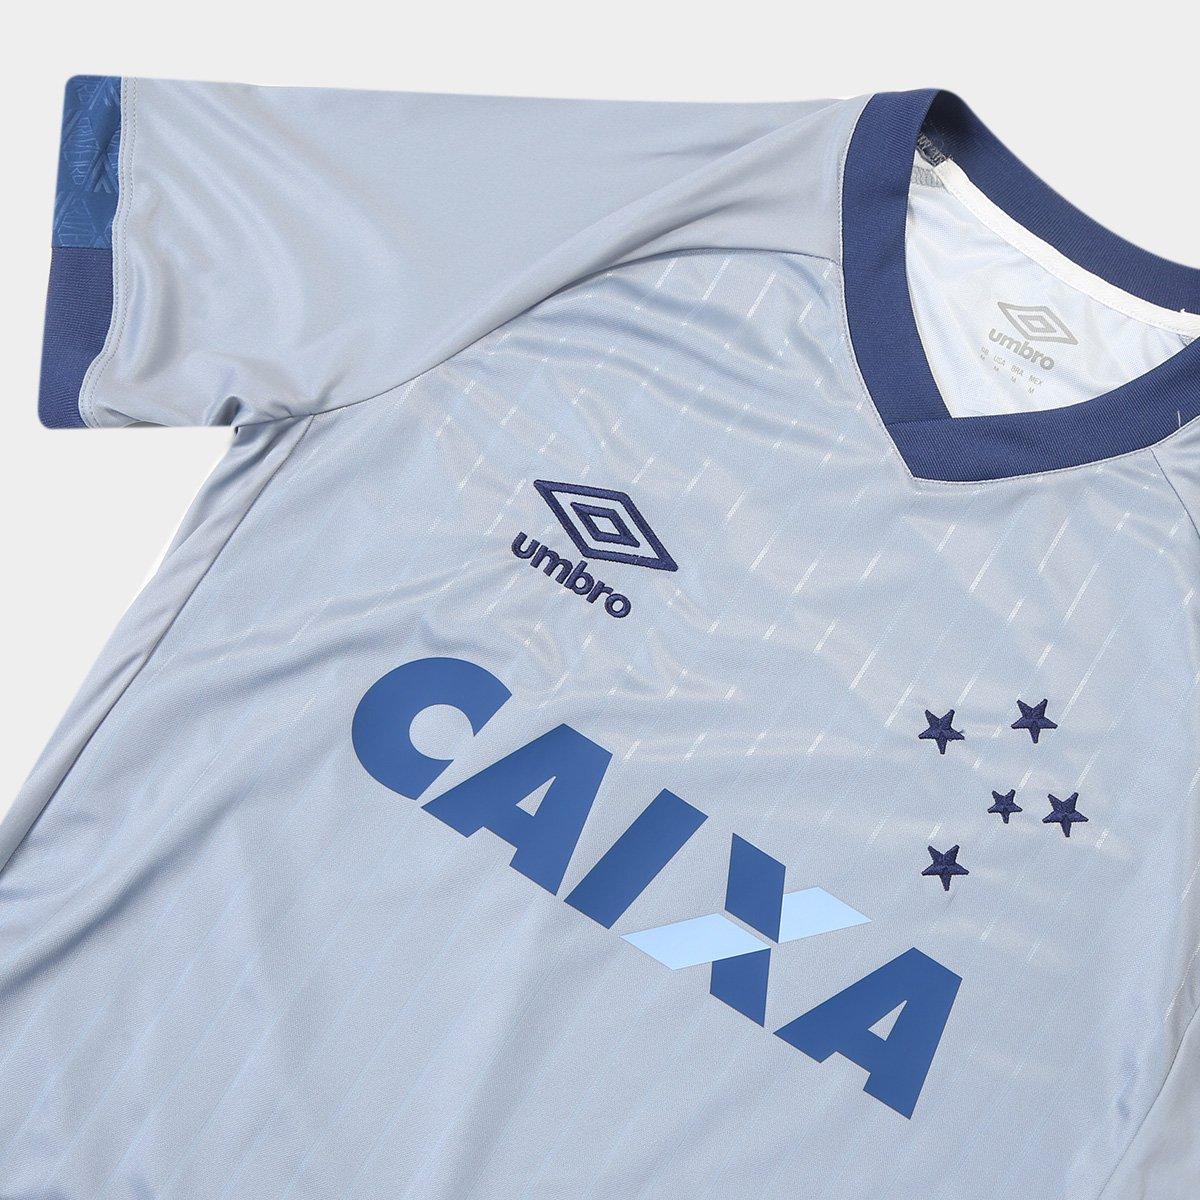 Camisa Cruzeiro III 18/19 s/n - Torcedor Umbro Masculina - Tam: GG - 3